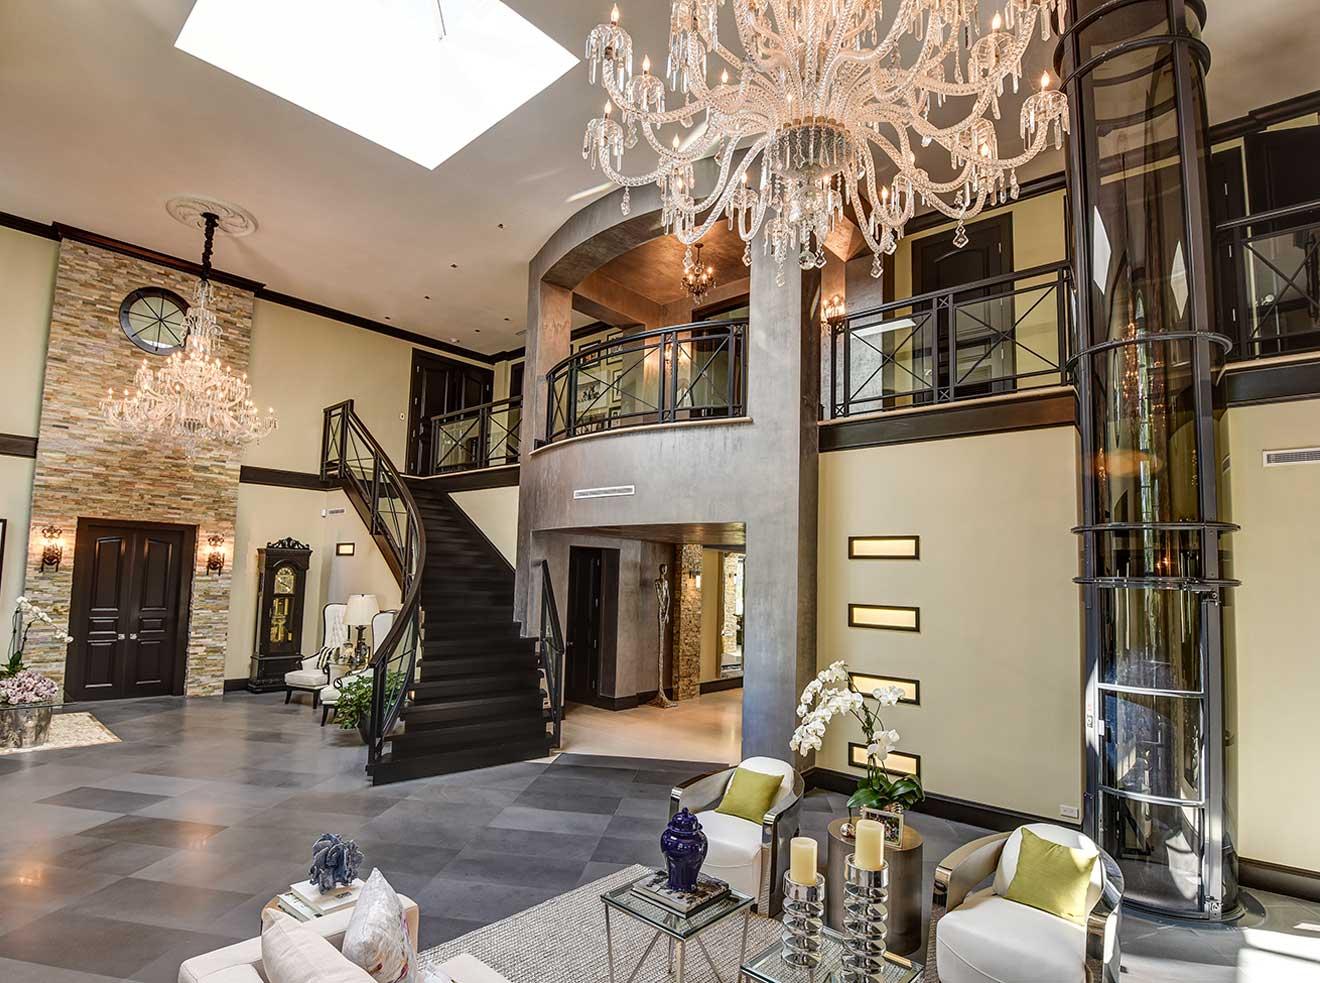 Villa Home Lift Signature Statement With Stylish Attire